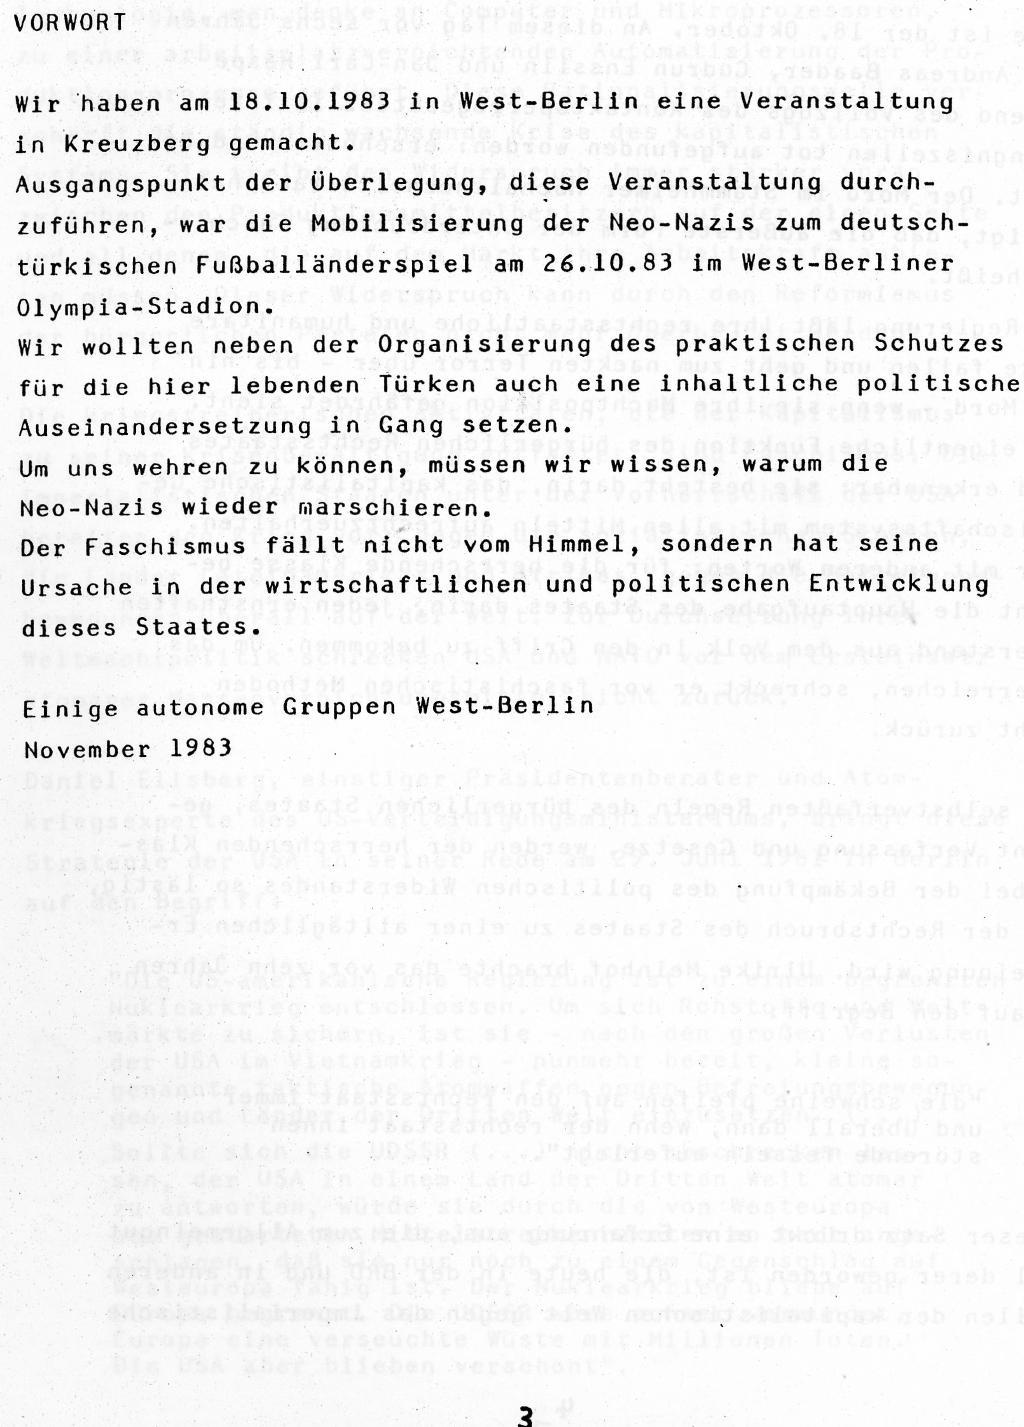 Berlin_1983_Autonome_Gruppen_Faschismus_im_Kapitalismus_03